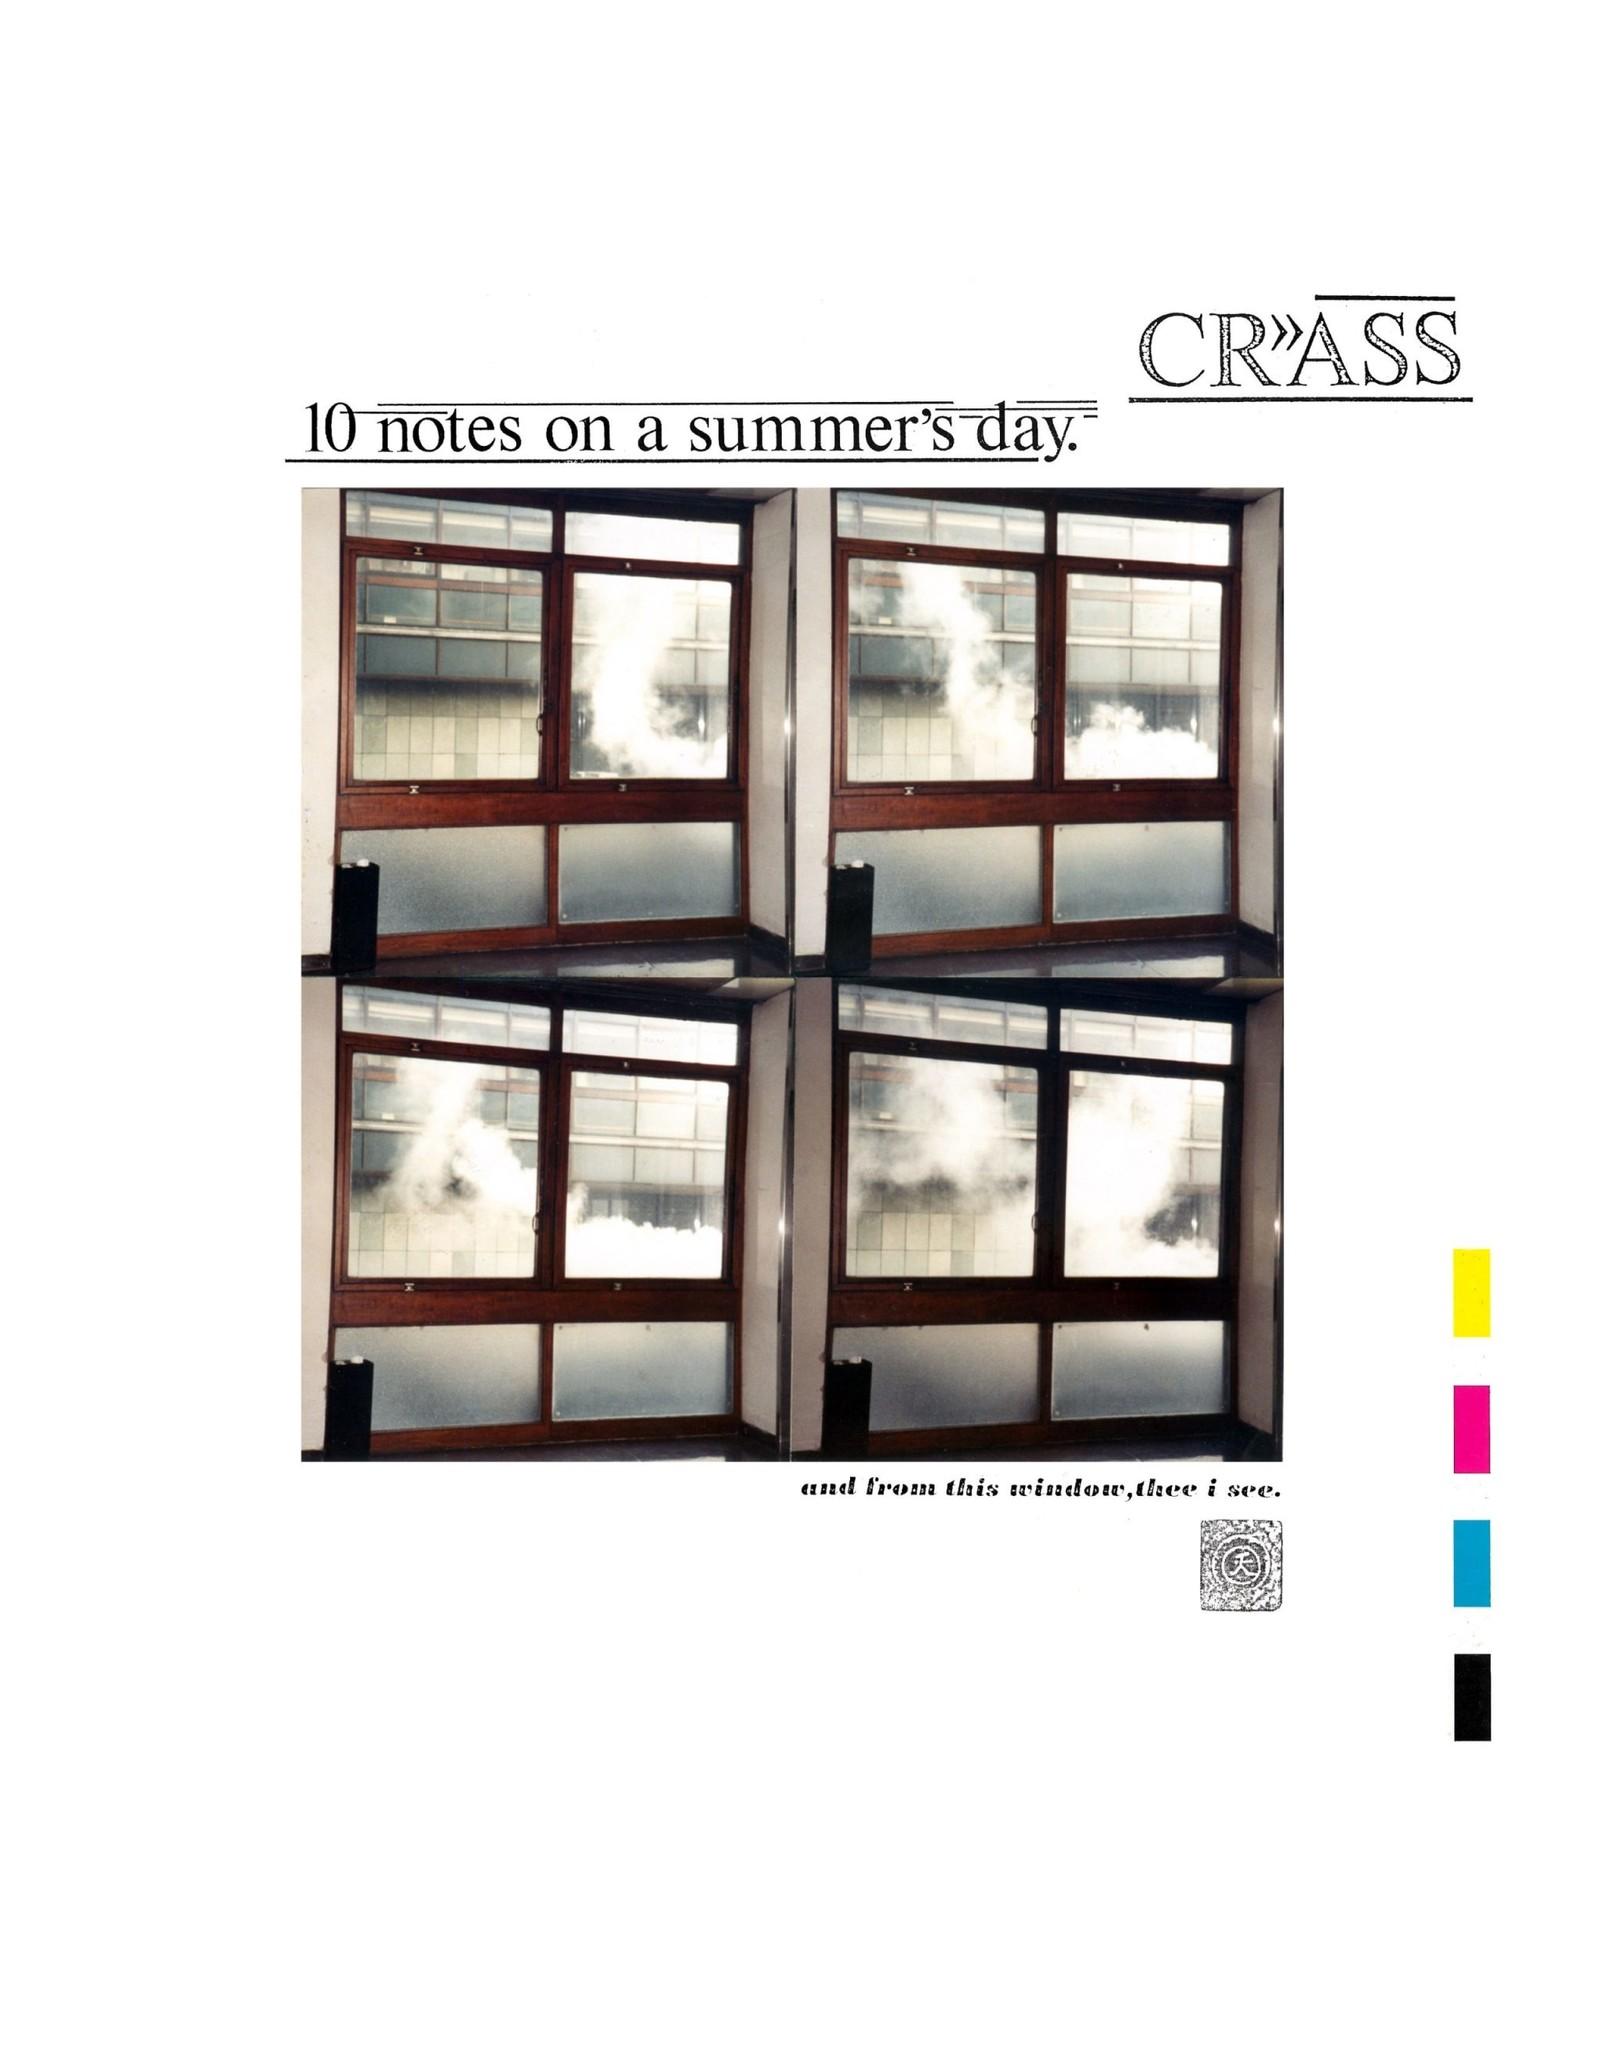 New Vinyl Crass - 10 Notes On A Summer's Day LP